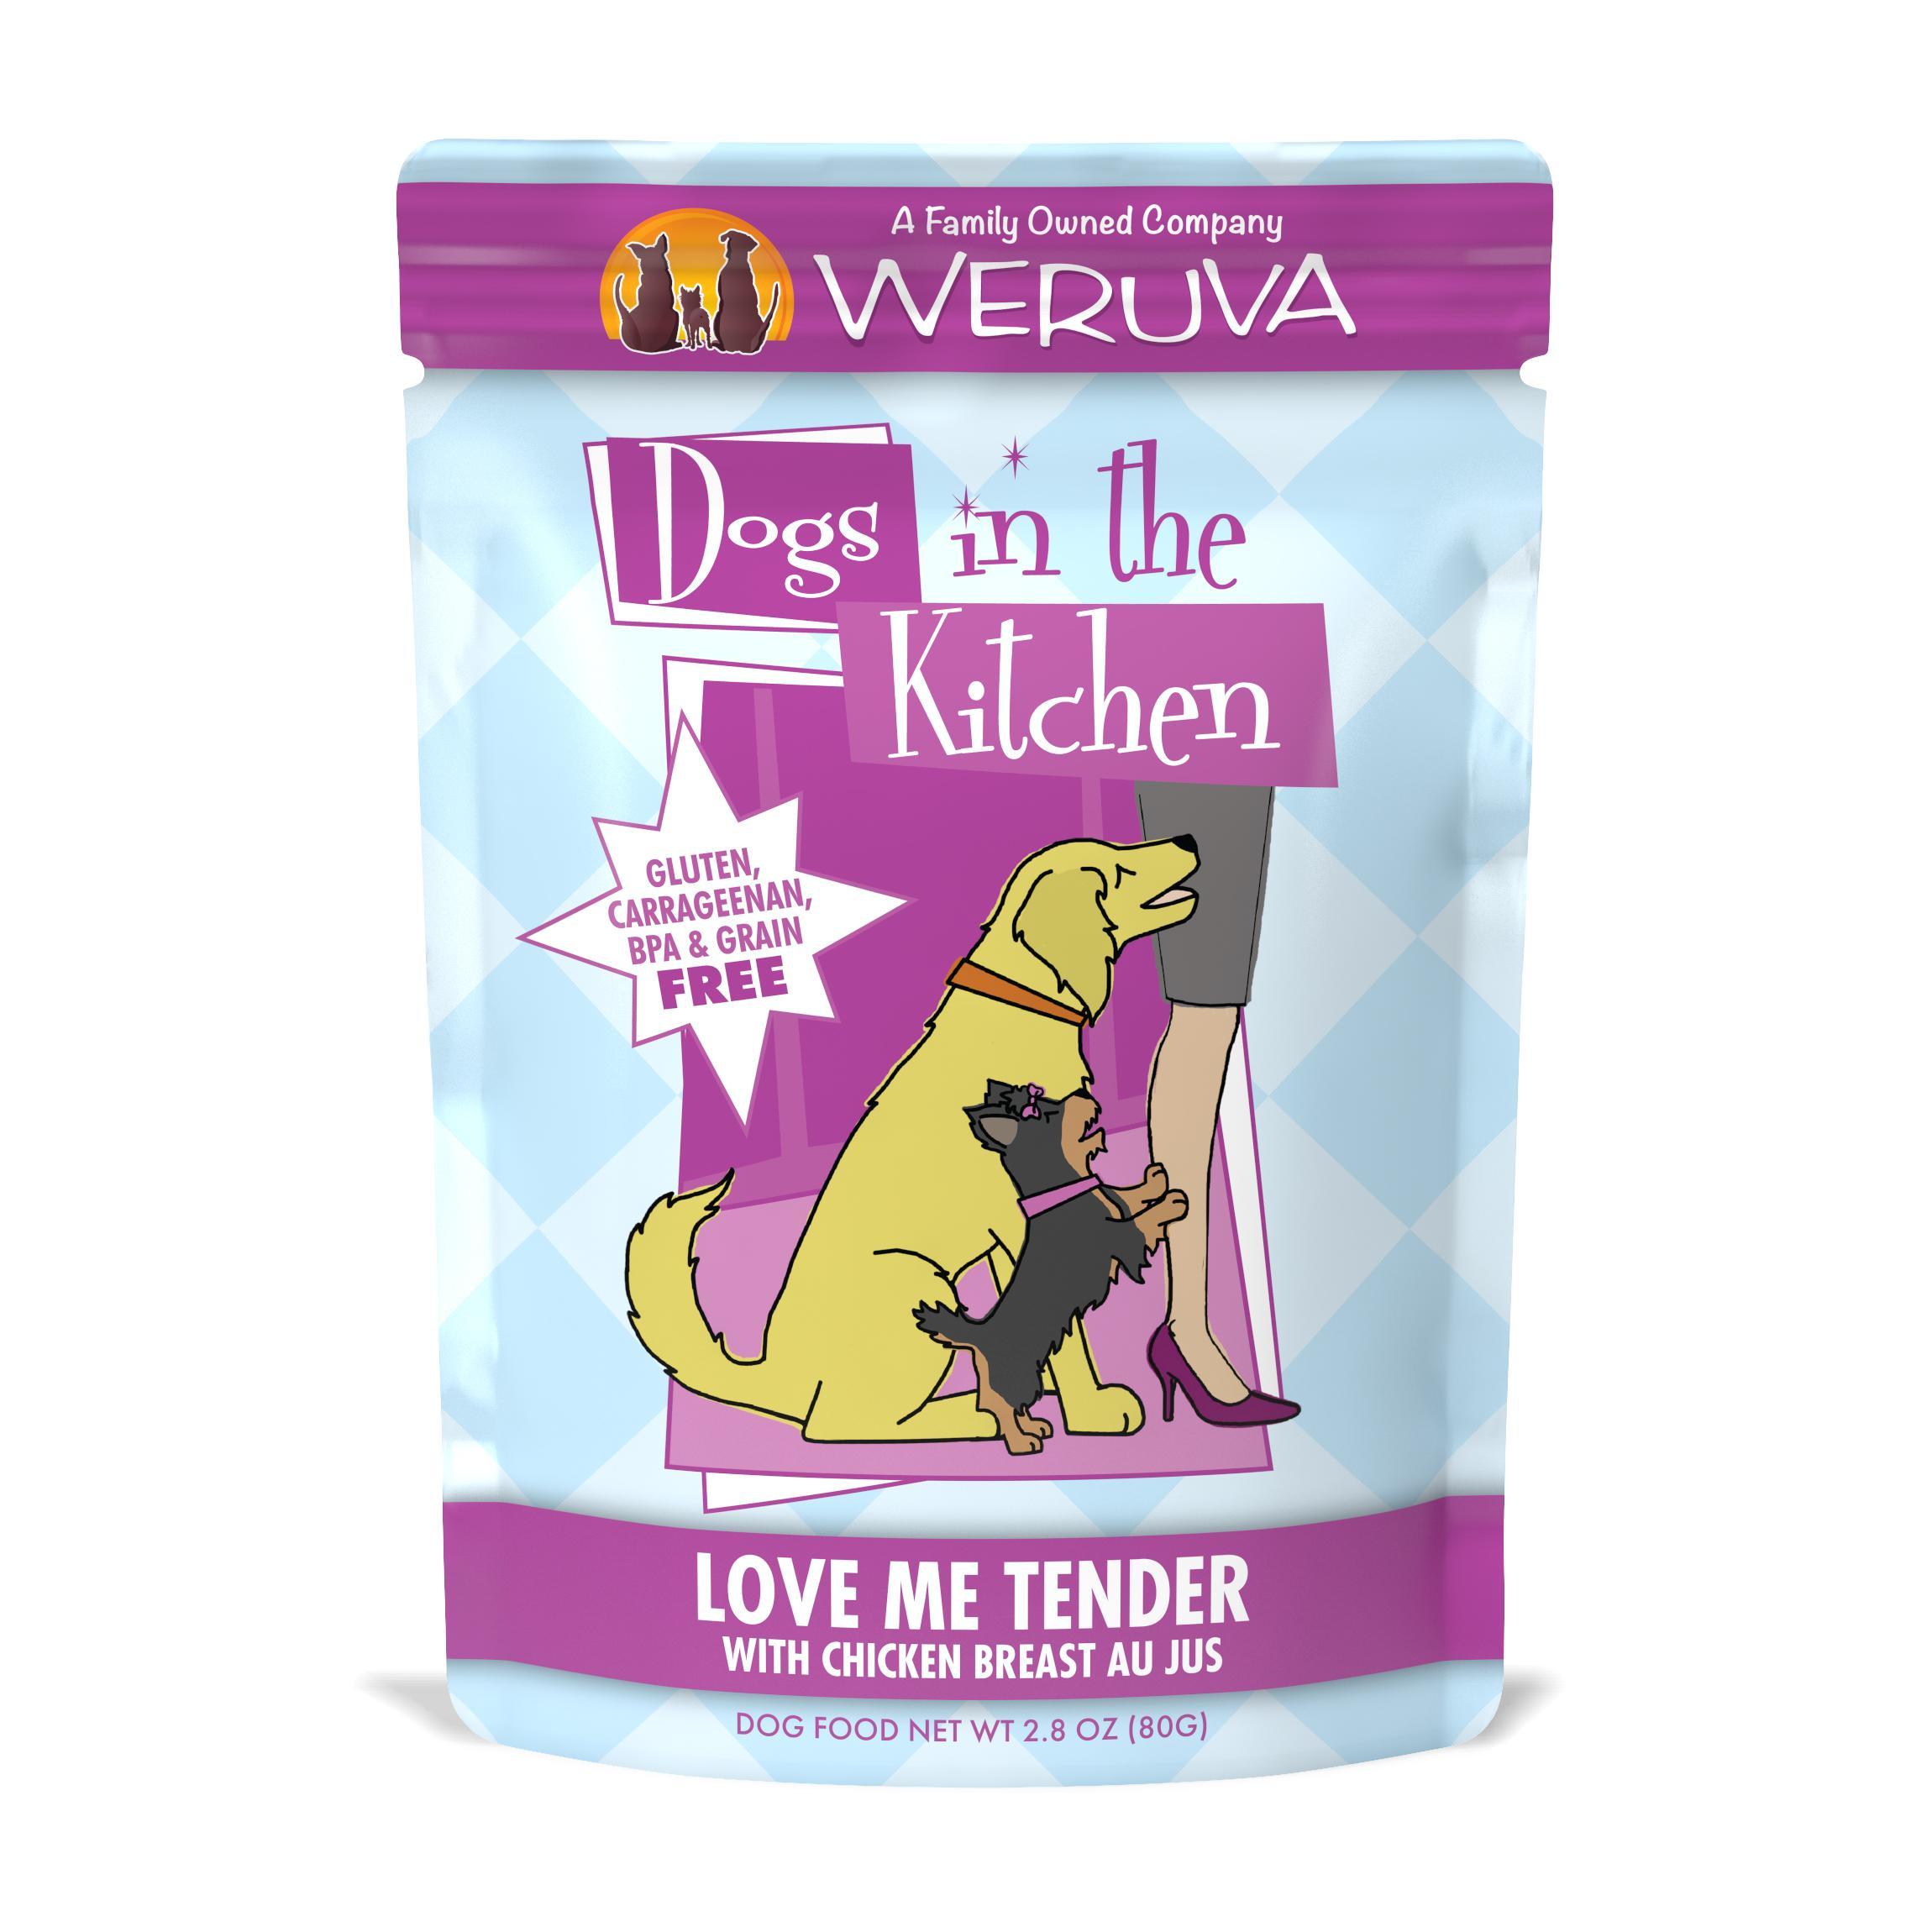 Weruva Dogs in the Kitchen Love Me Tender with Chicken Breast Au Jus Grain-Free Wet Dog Food, 2.8-oz